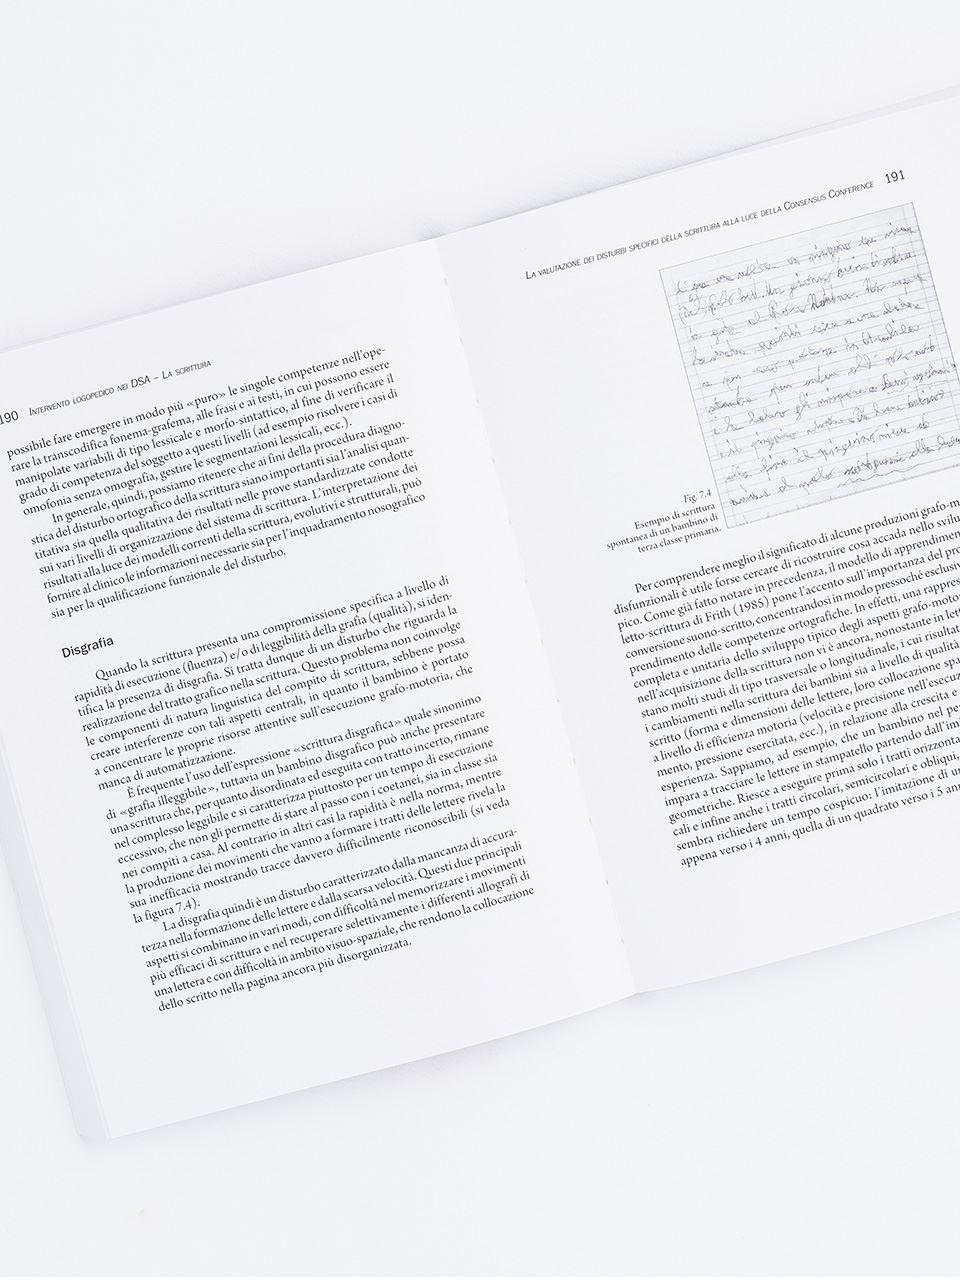 Intervento logopedico nei DSA - LA SCRITTURA - Libri - Erickson 2